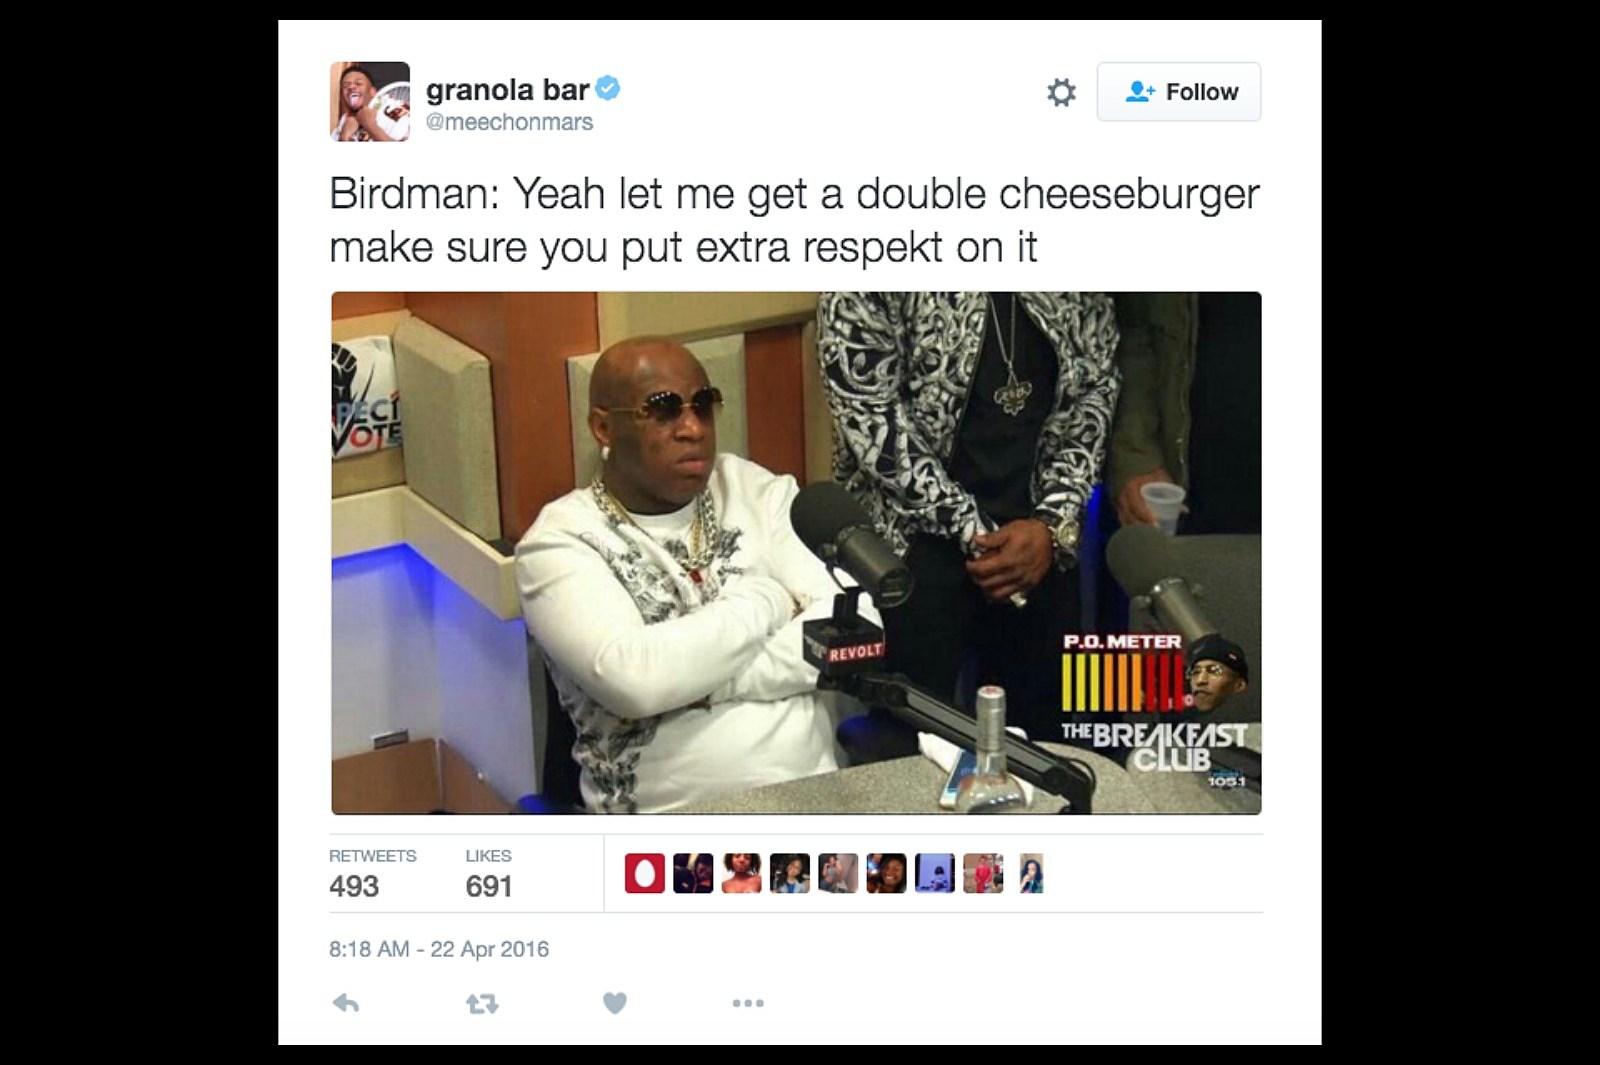 Birdman meme 1 12 funny memes featuring birdman's 'the breakfast club' interview xxl